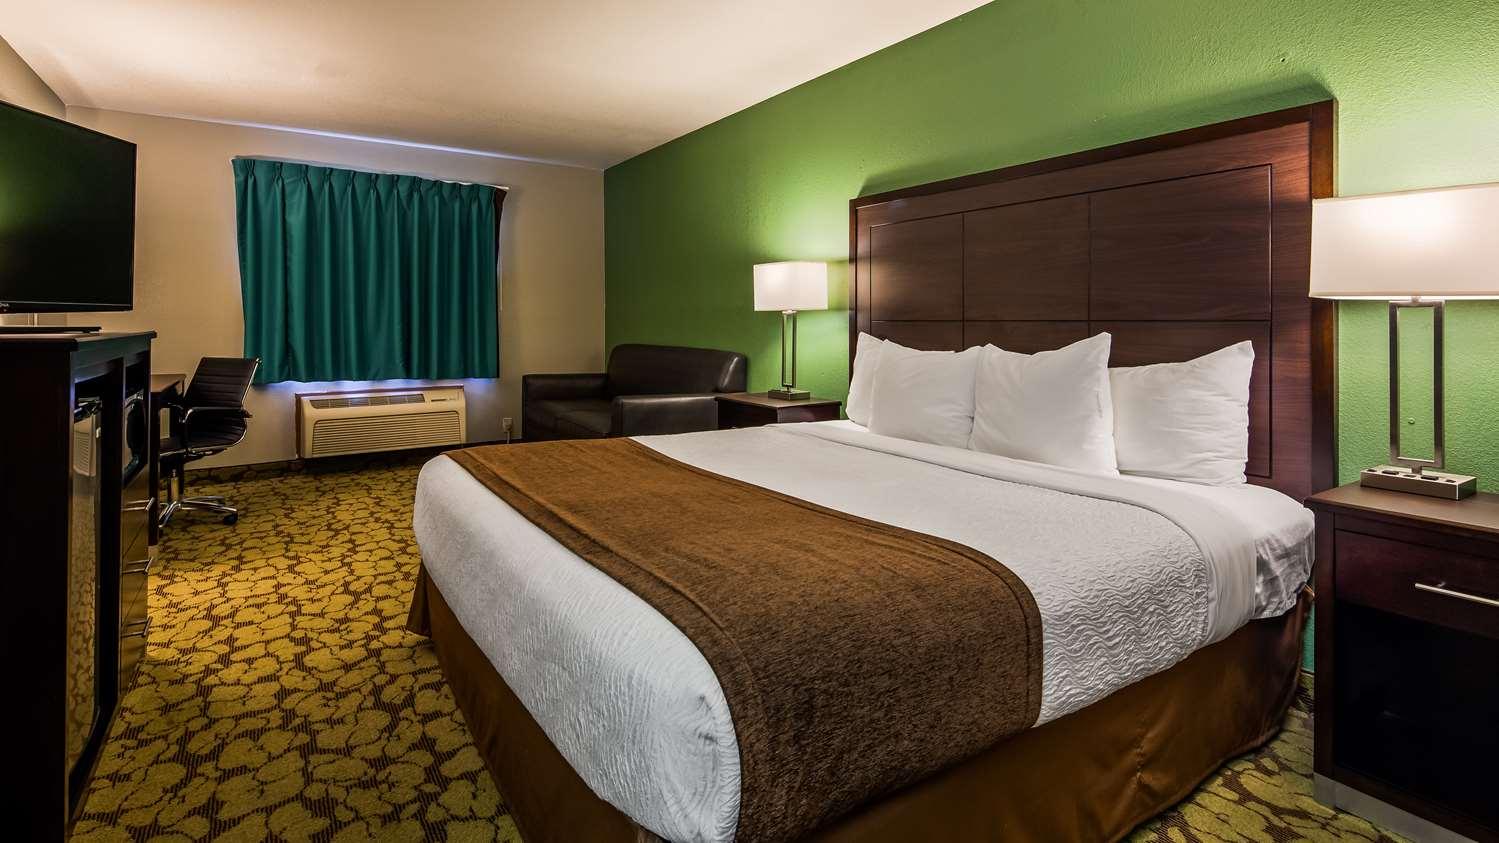 Room - SureStay Plus Hotel by Best Western Bettendorf